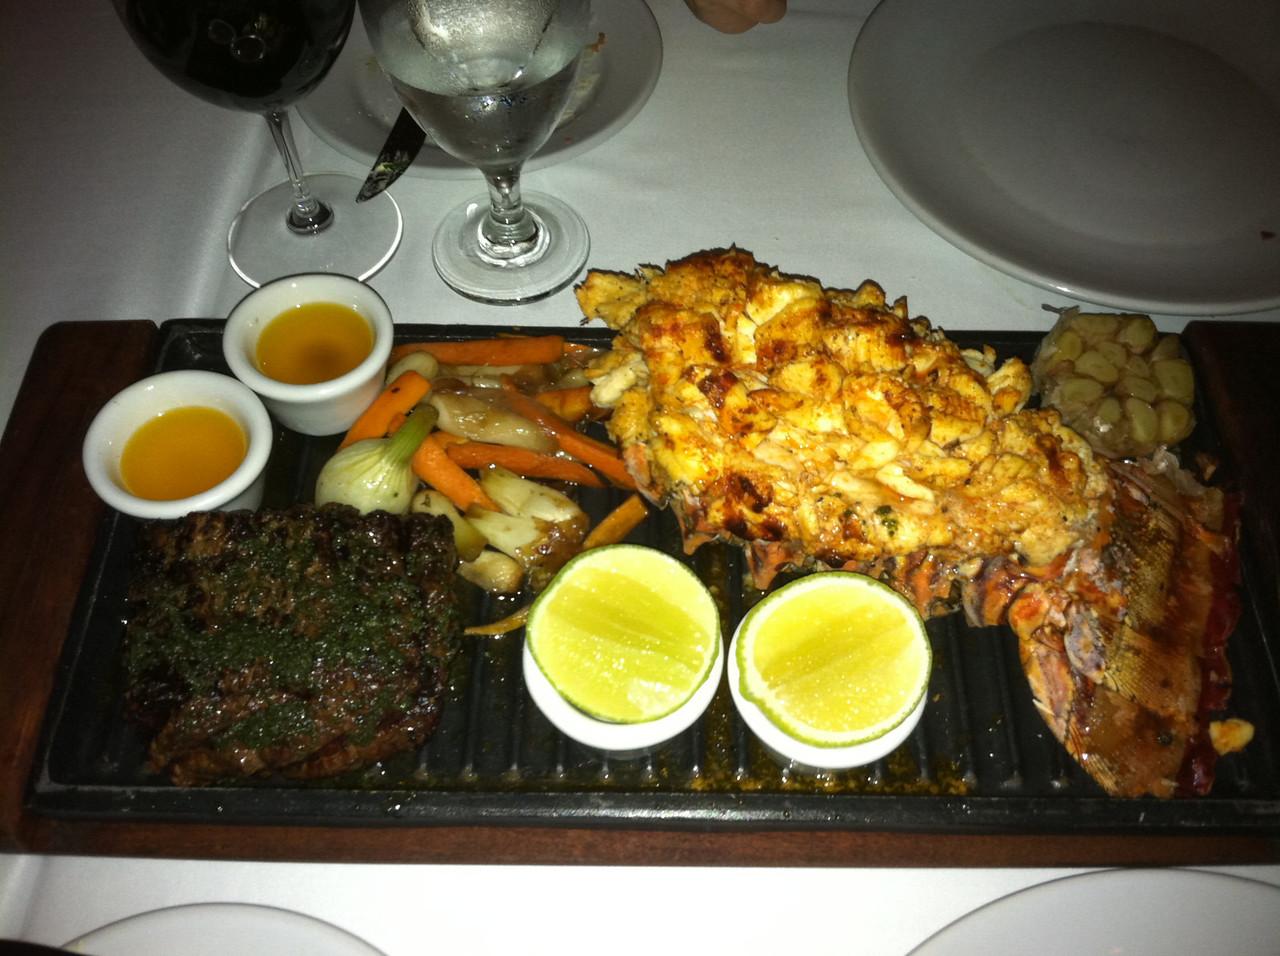 Filet and jumbo lobster tail at La Capilla Argentine steak house - JW Marriott.